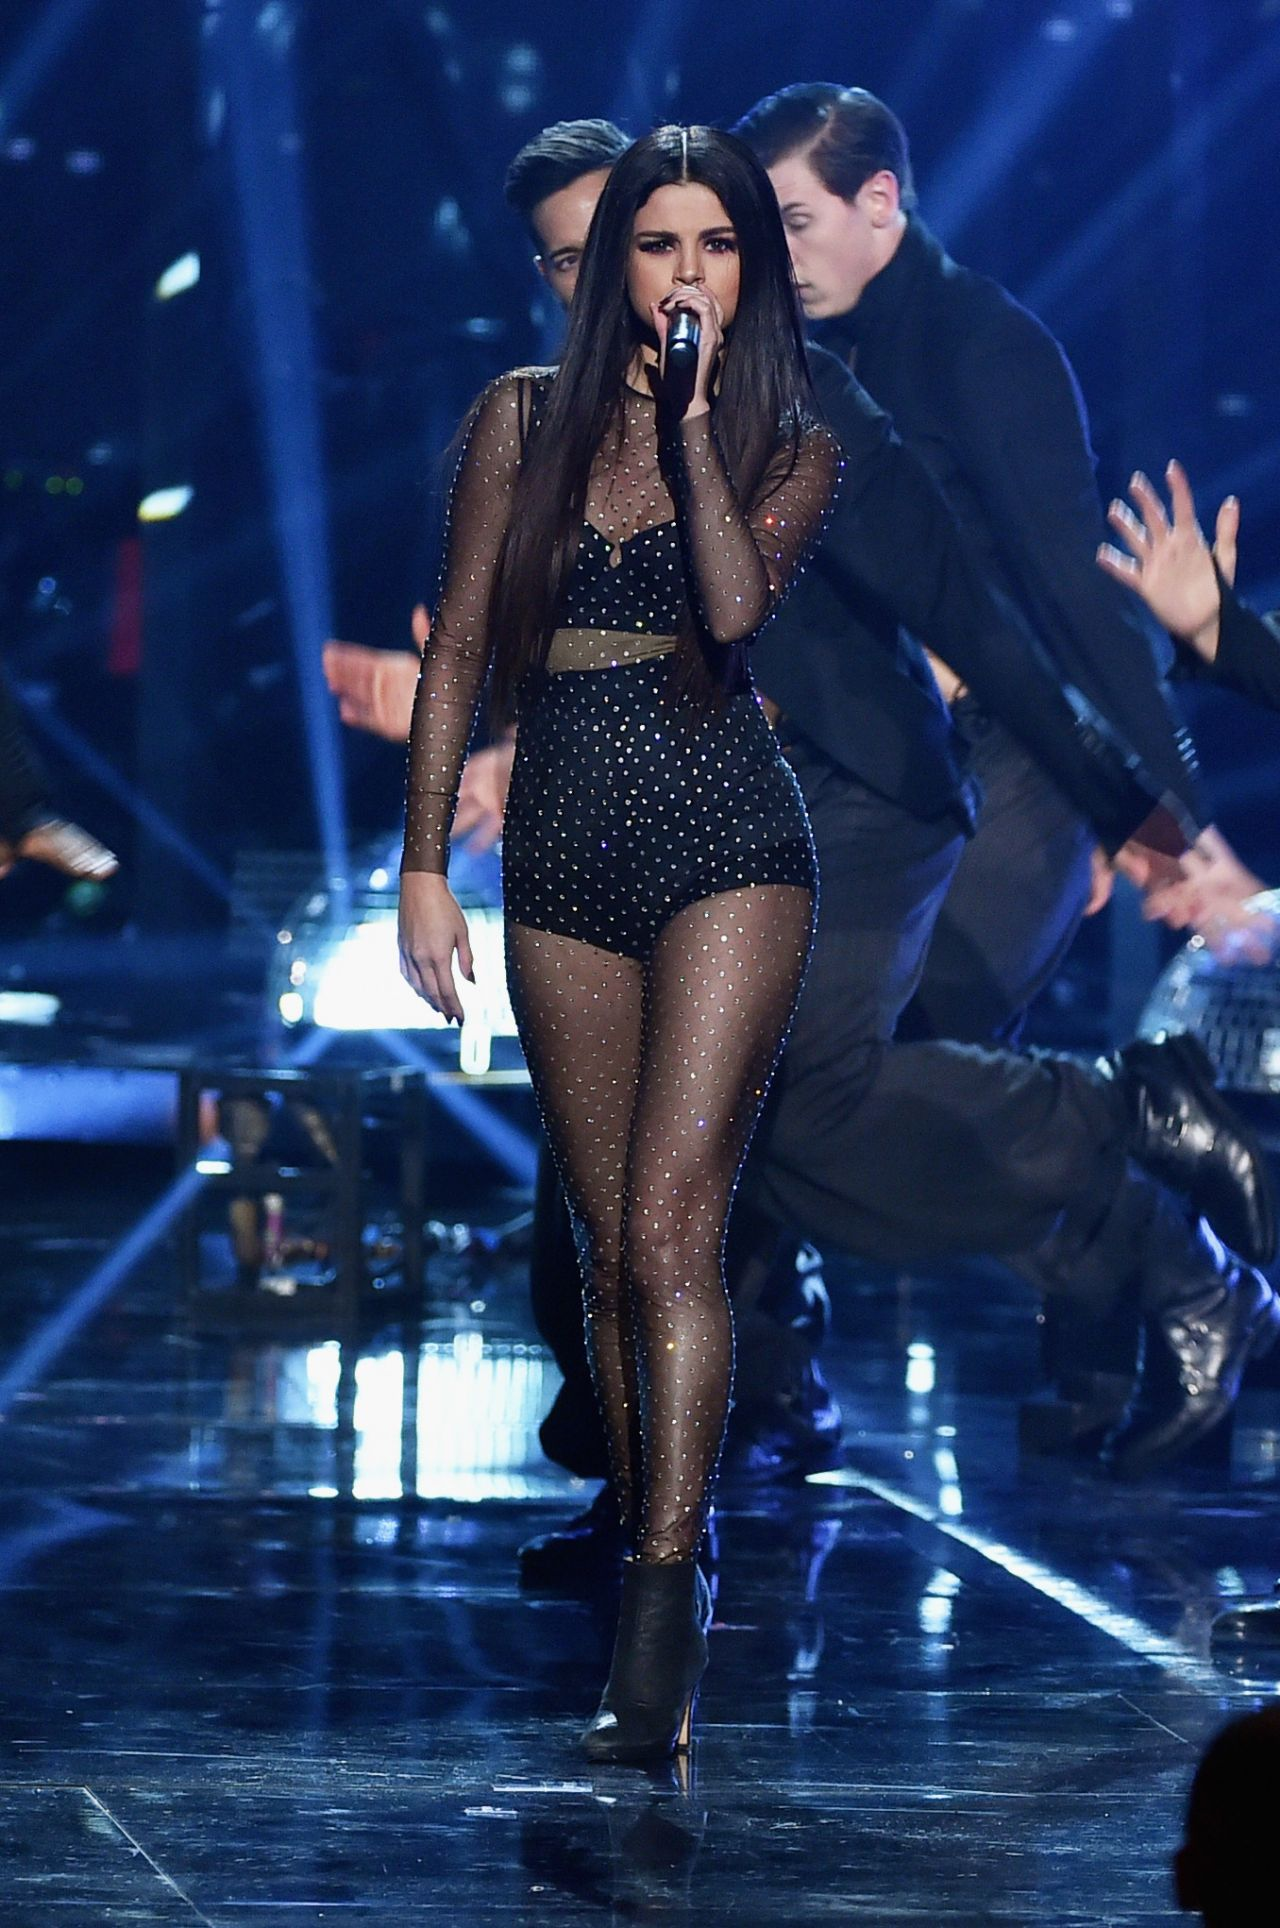 Selena Gomez Performs At 2015 American Music Awards In Los